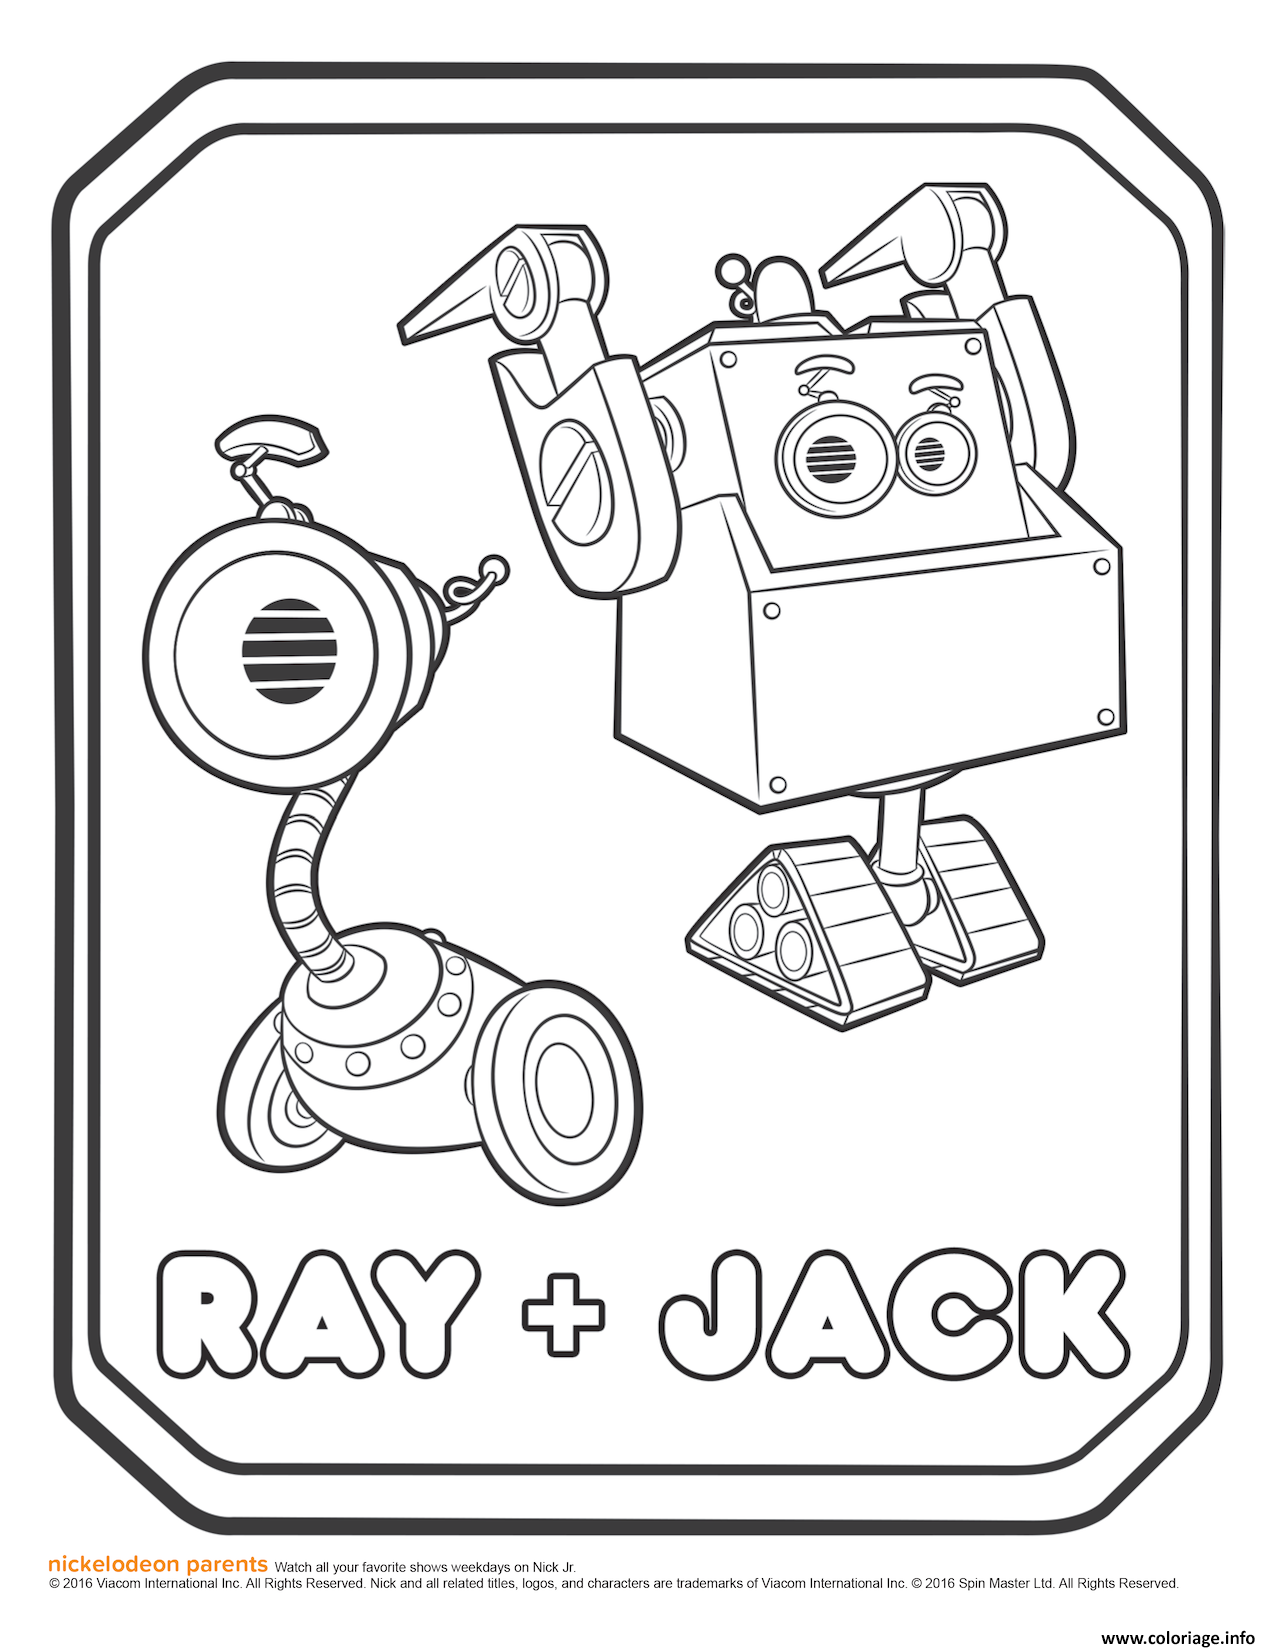 Dessin Rusty Rivets Ray and Jack Coloring Page Coloriage Gratuit à Imprimer